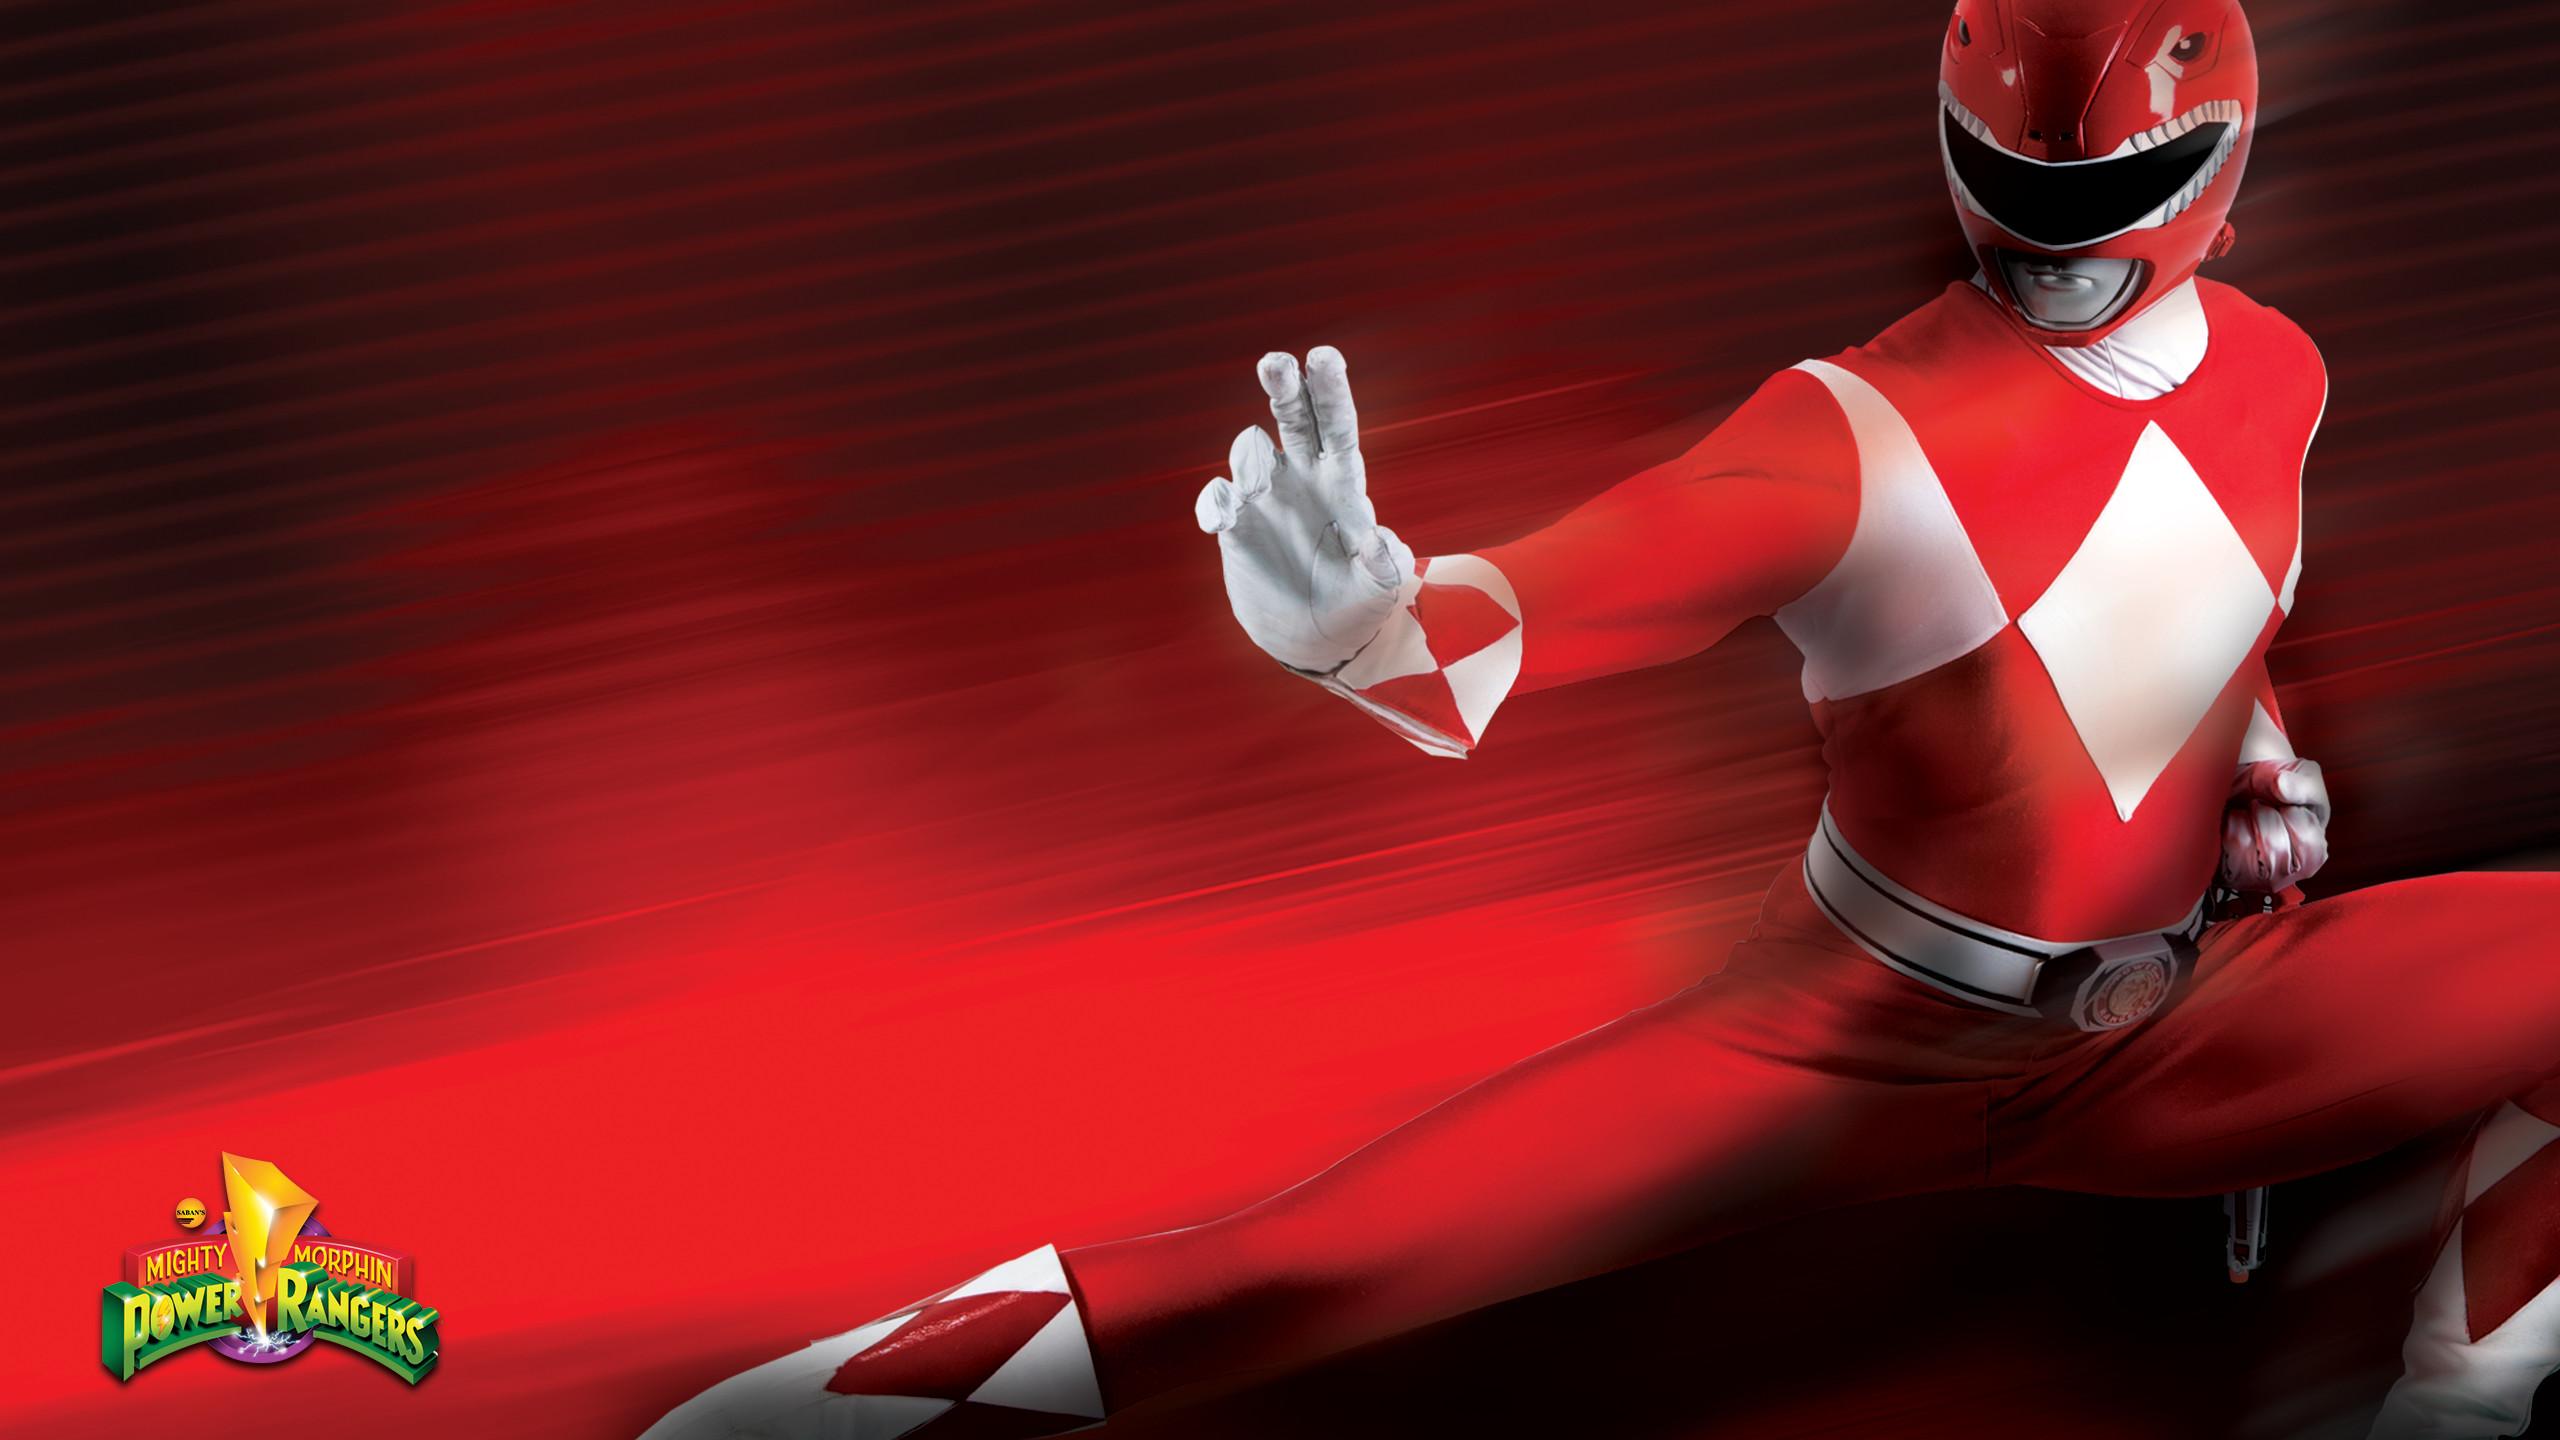 Red Ranger Wallpaper – Power Rangers – The Official Power Rangers .